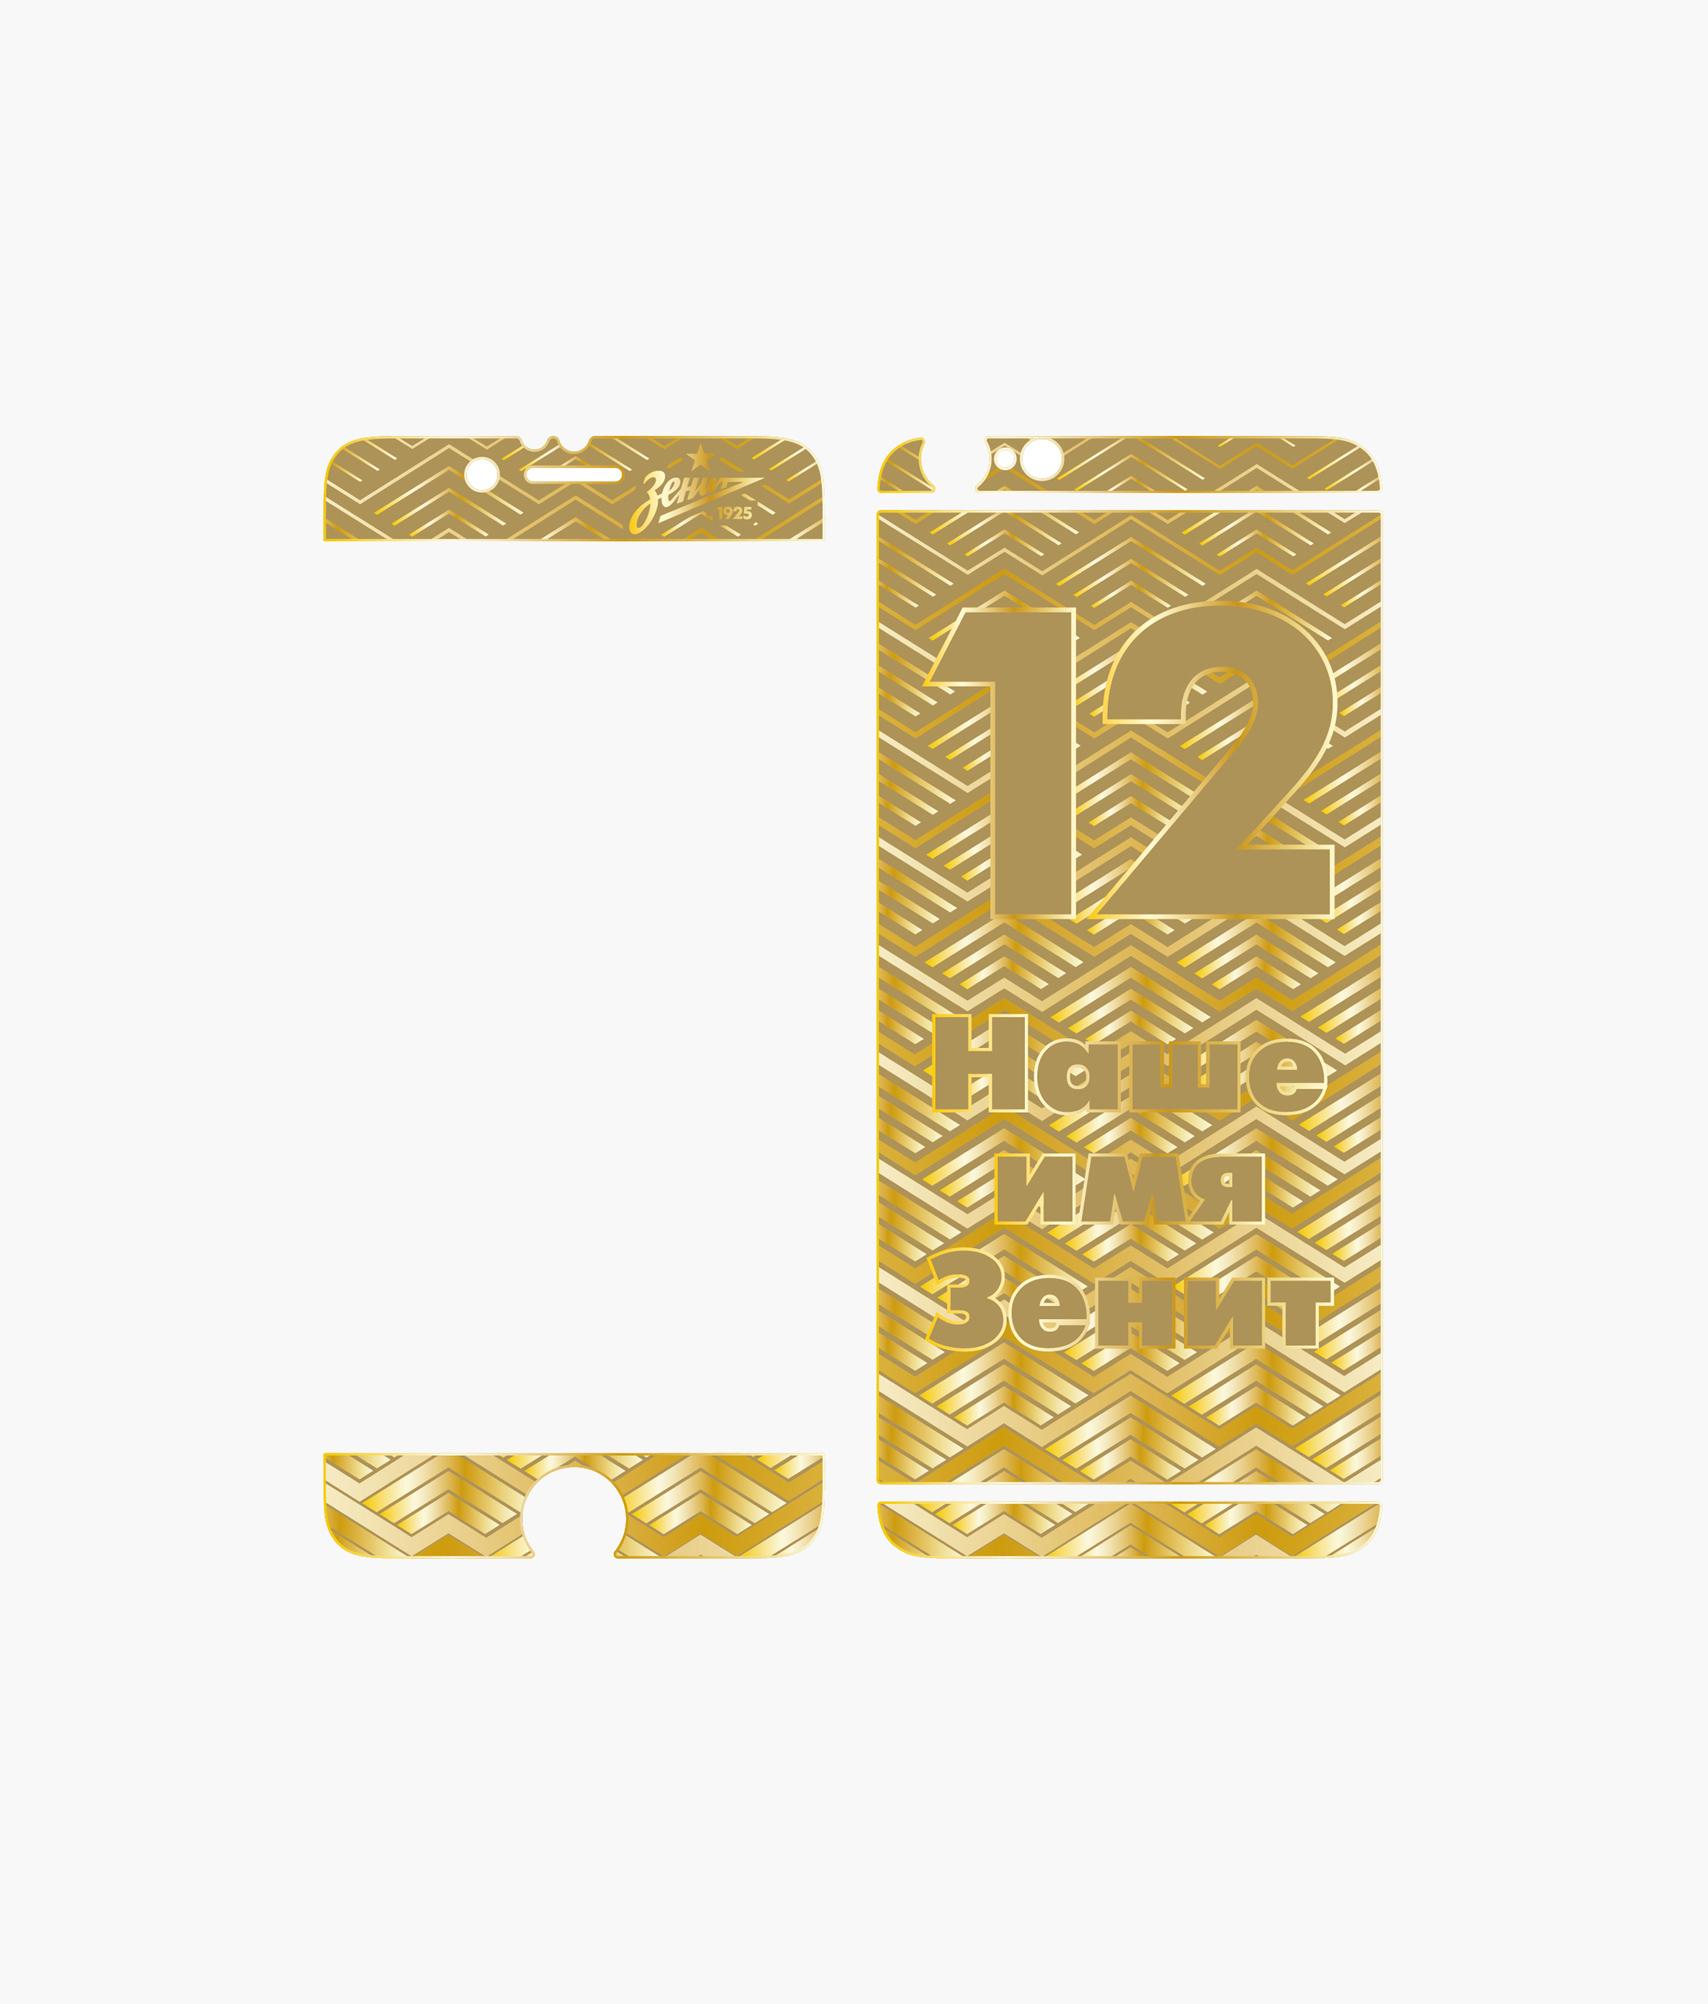 Фото - Золотая наклейка на Iphone 6 «Наше имя Зенит» Зенит украшение